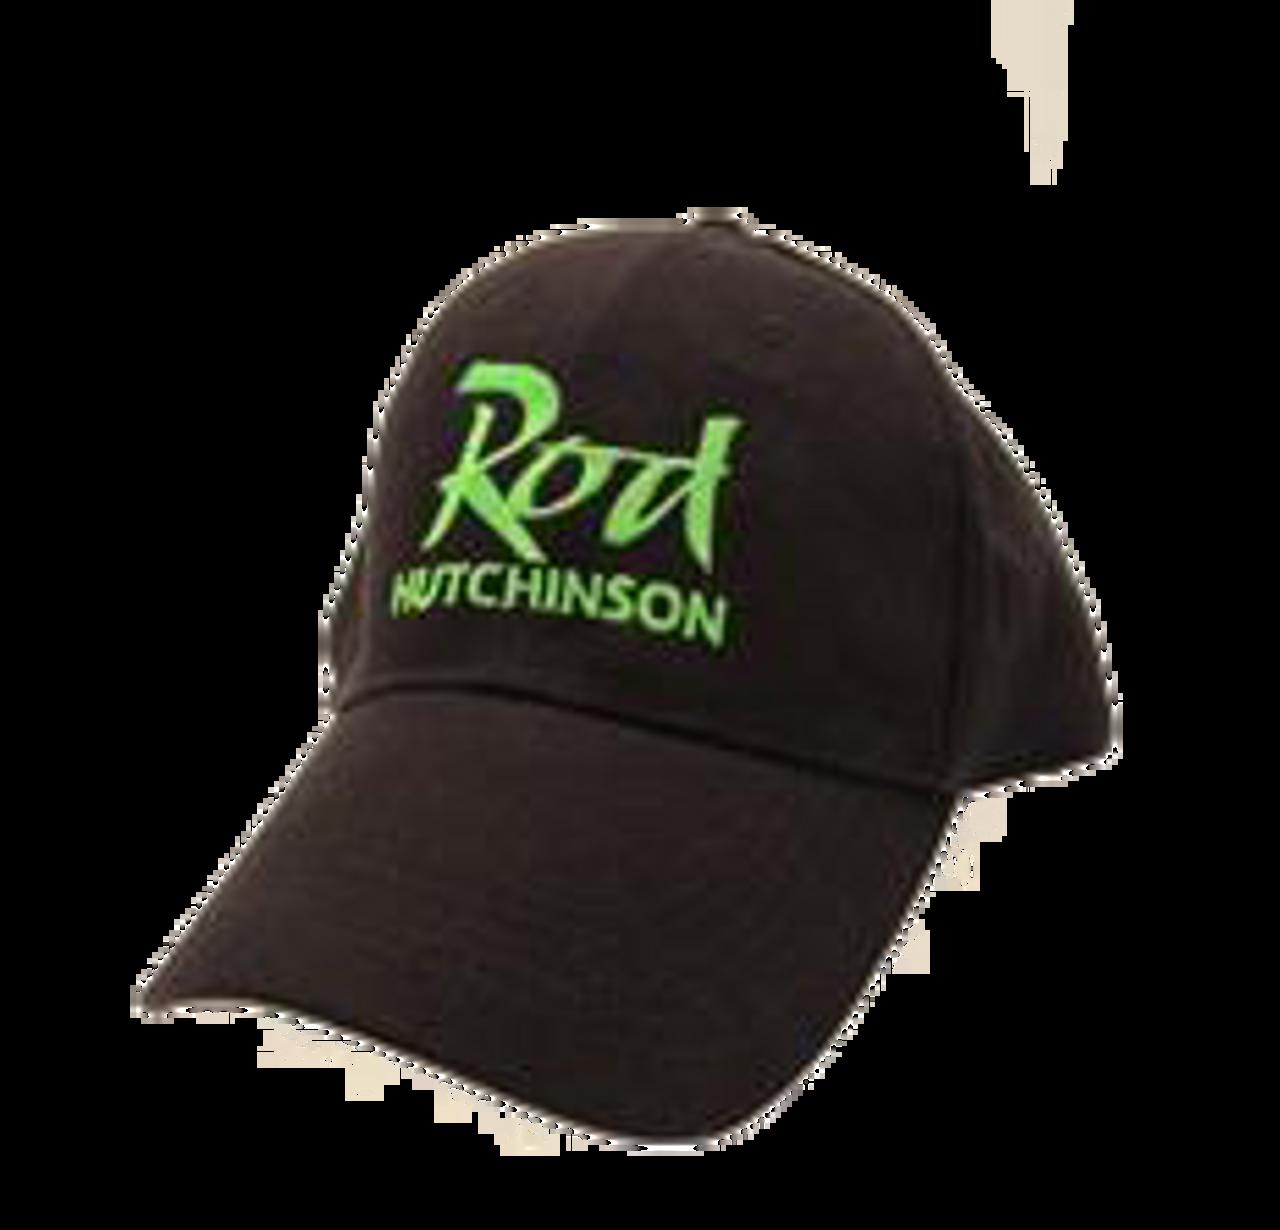 Rod Hutchinson Baseball Cap Black with green Emborodery